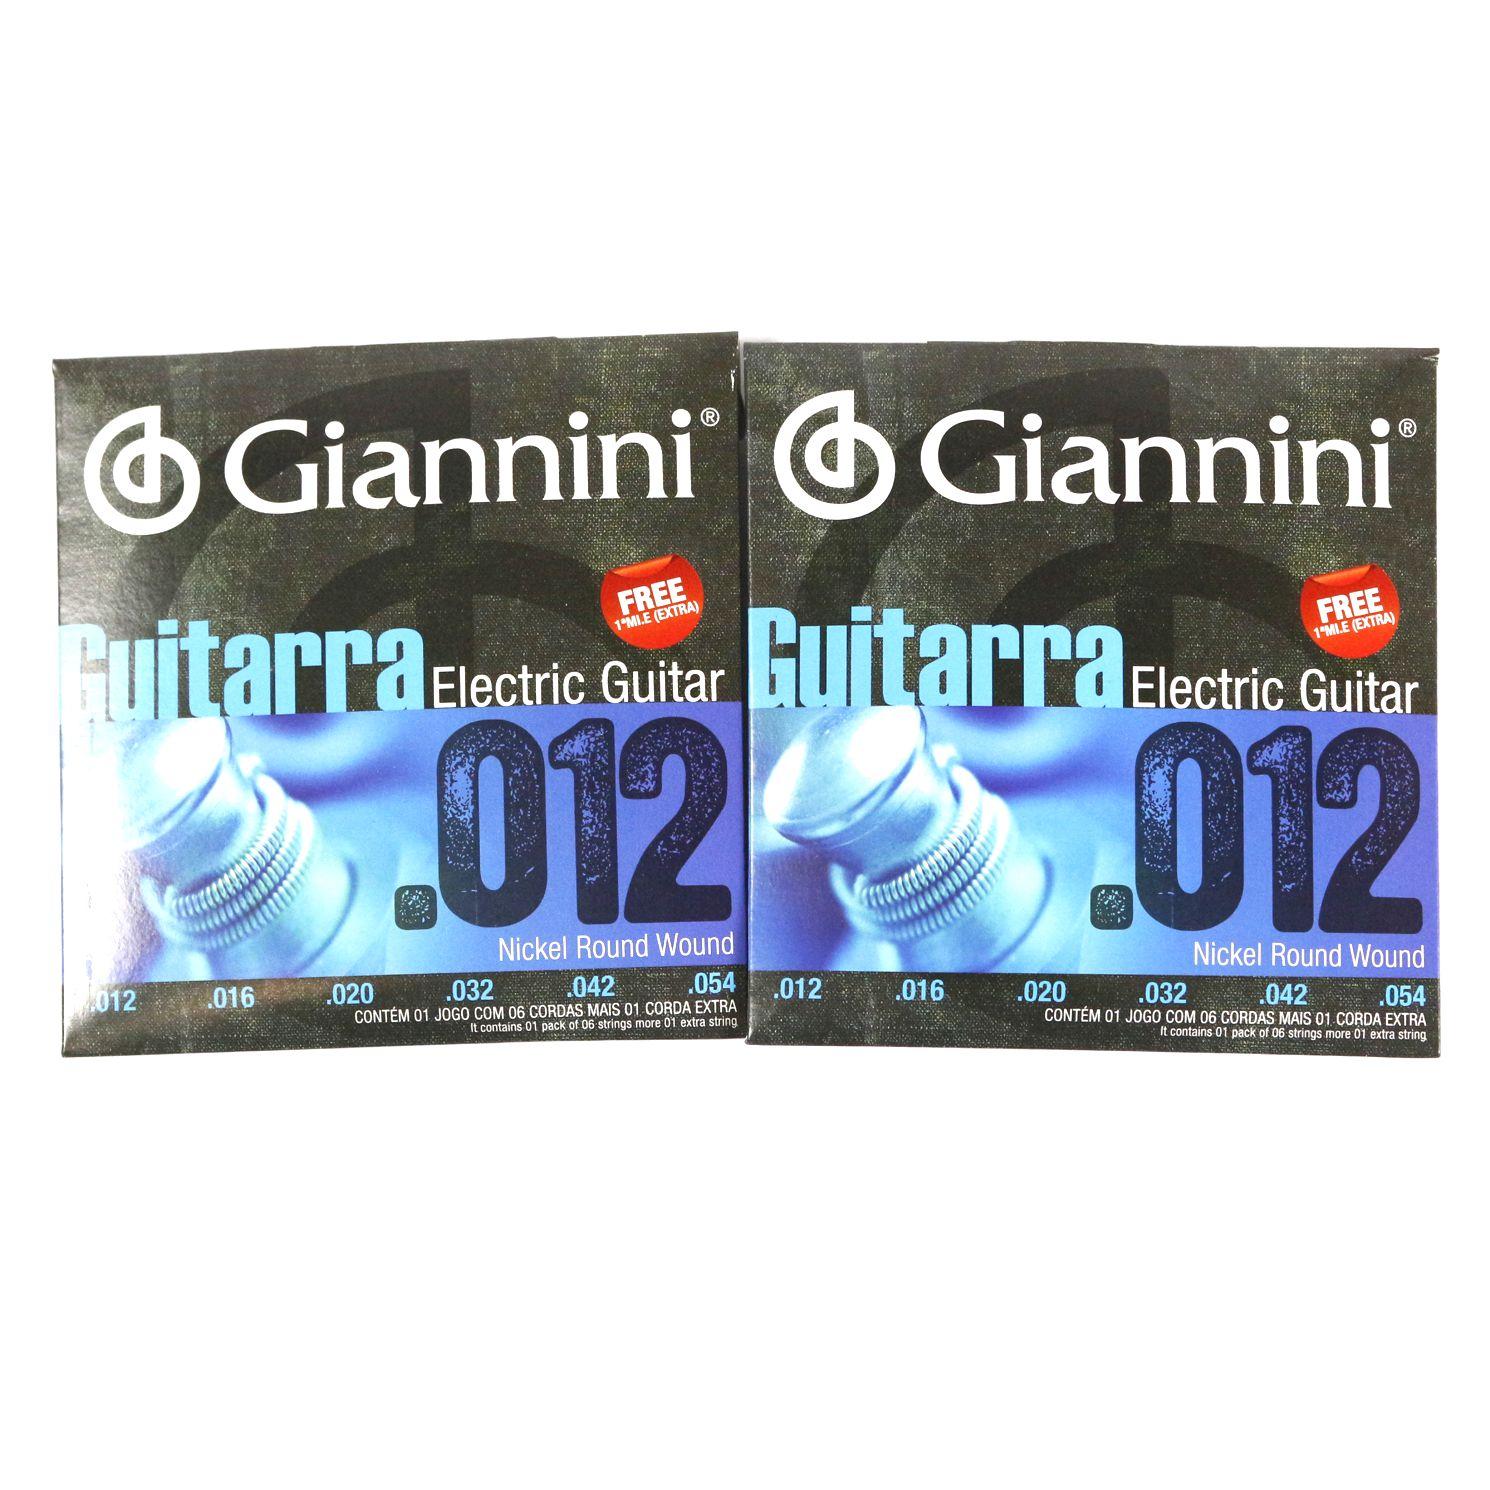 Encordoamento Giannini Guitarra Nickel Round Wound + MÍ EXTRA .012 GEEGST12 - 02 KITS